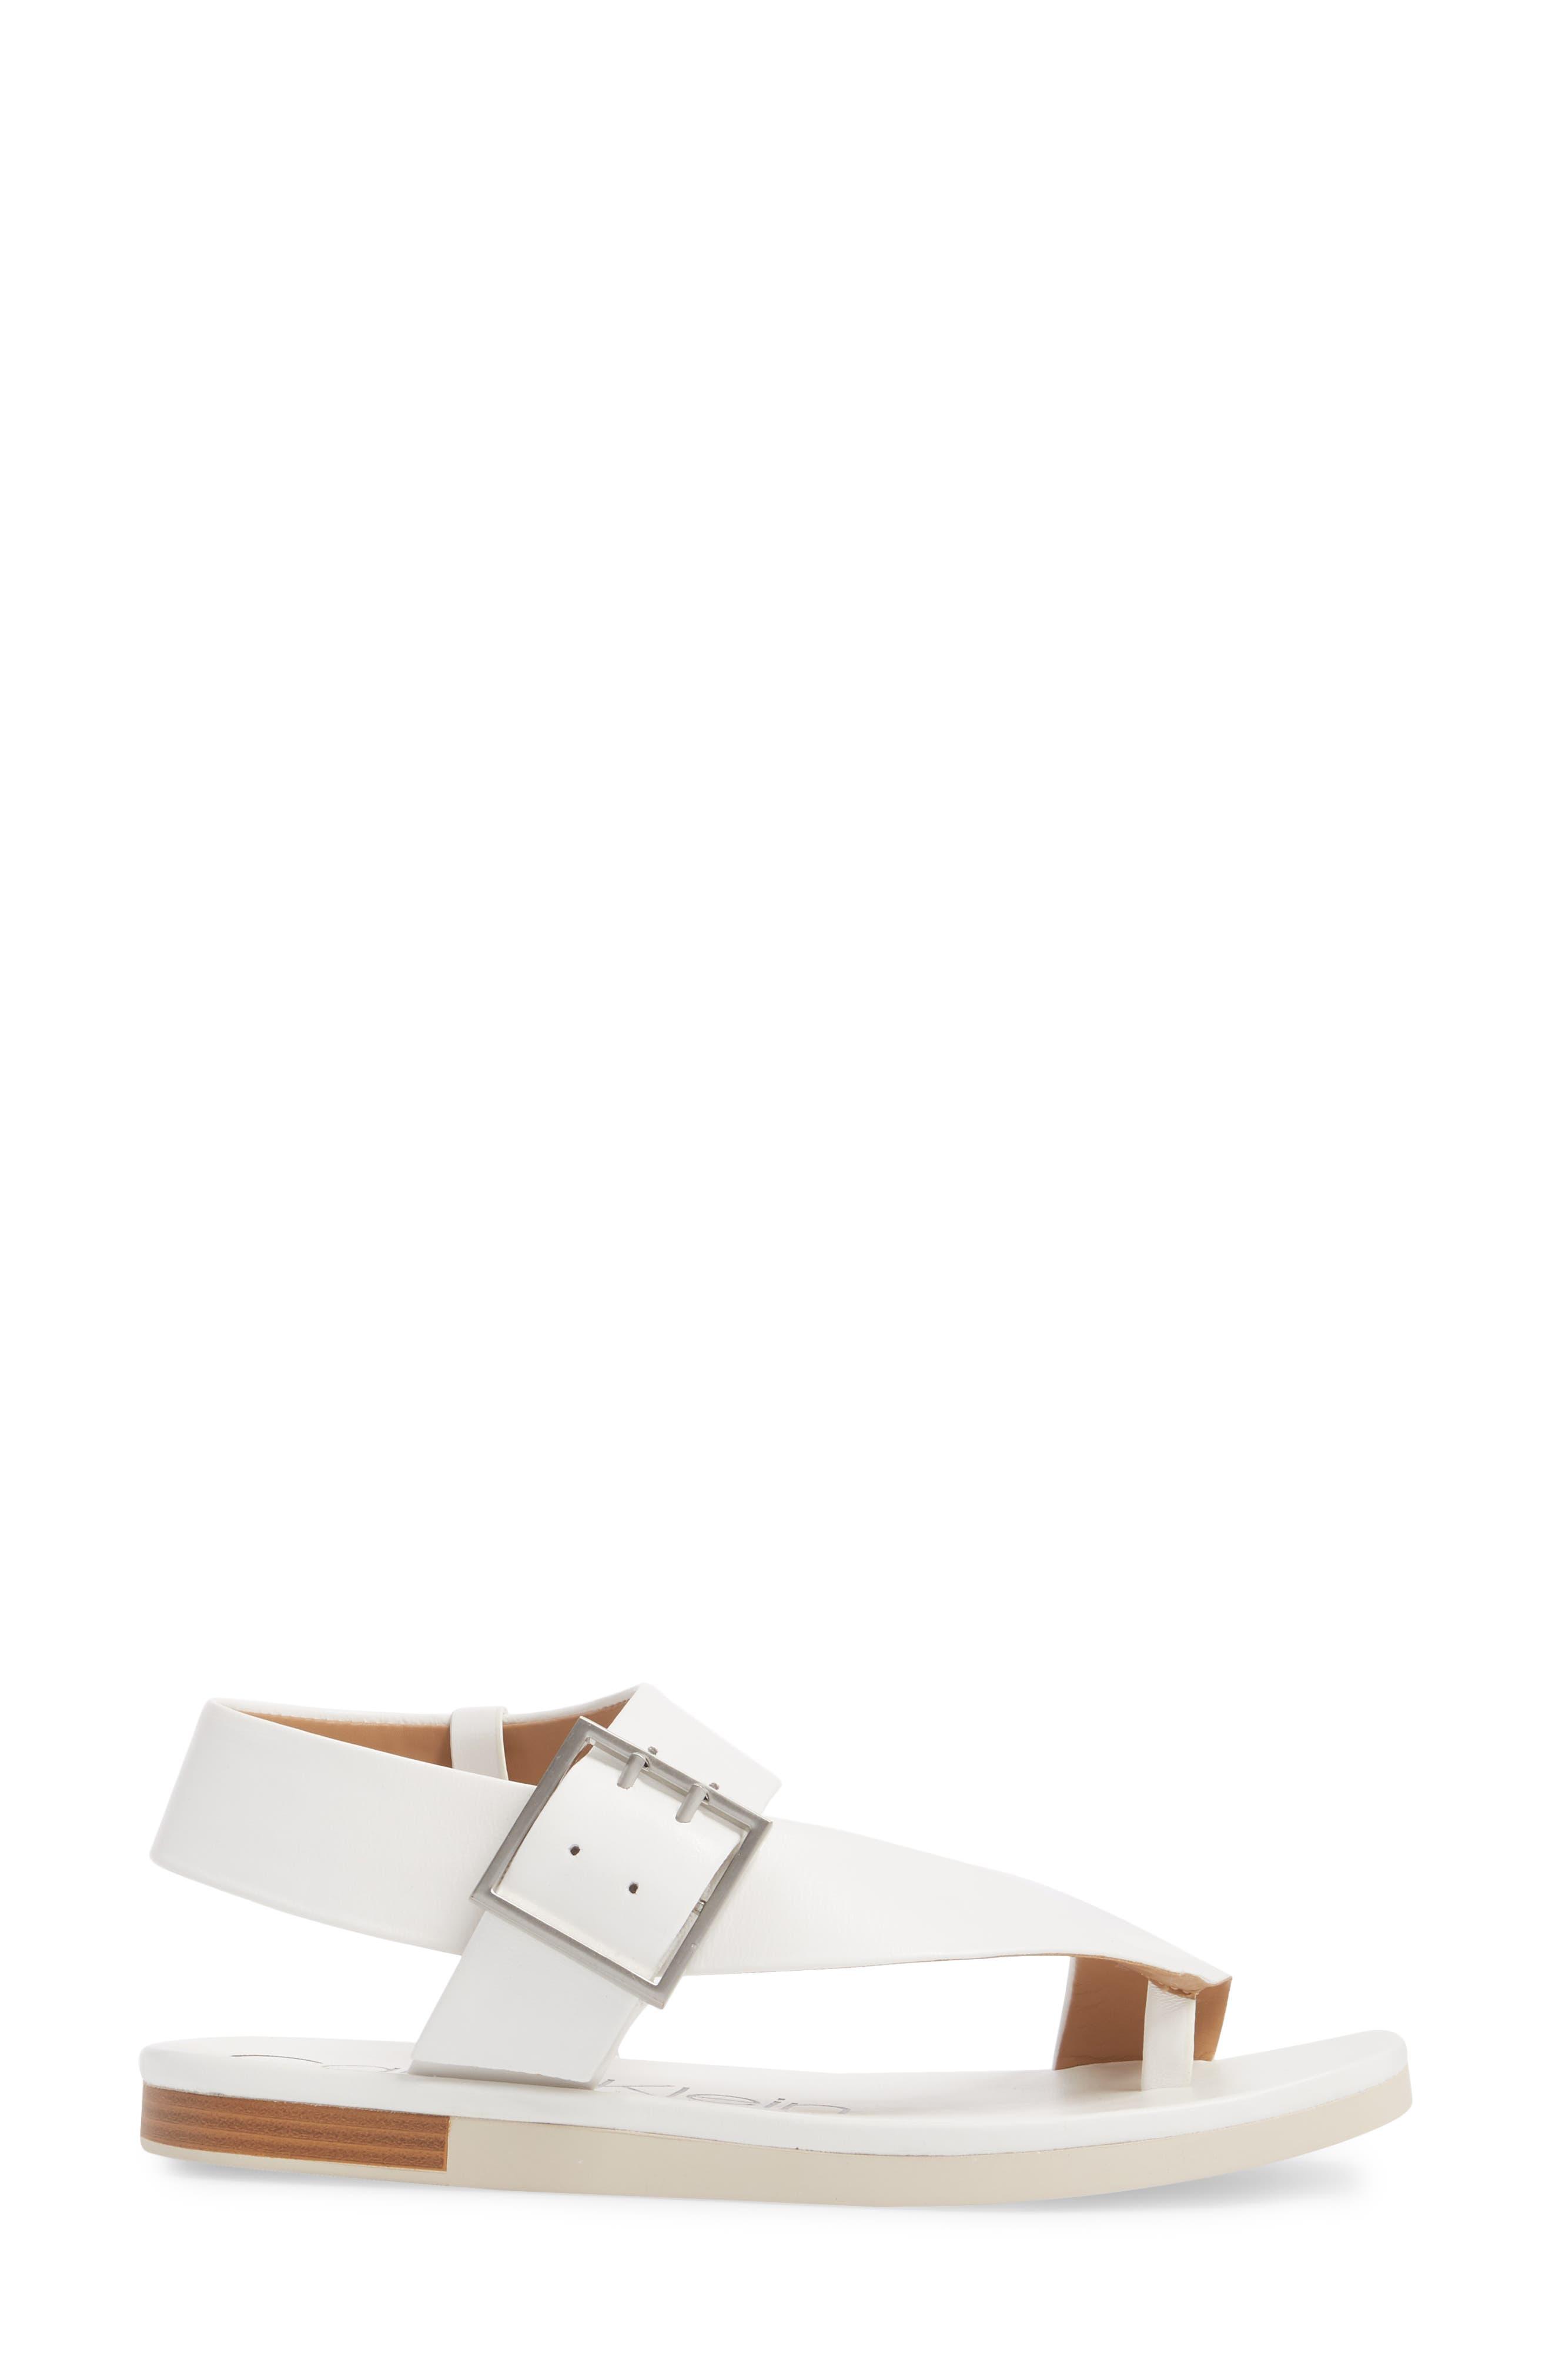 Rivita Sandal,                             Alternate thumbnail 3, color,                             Platinum White Leather